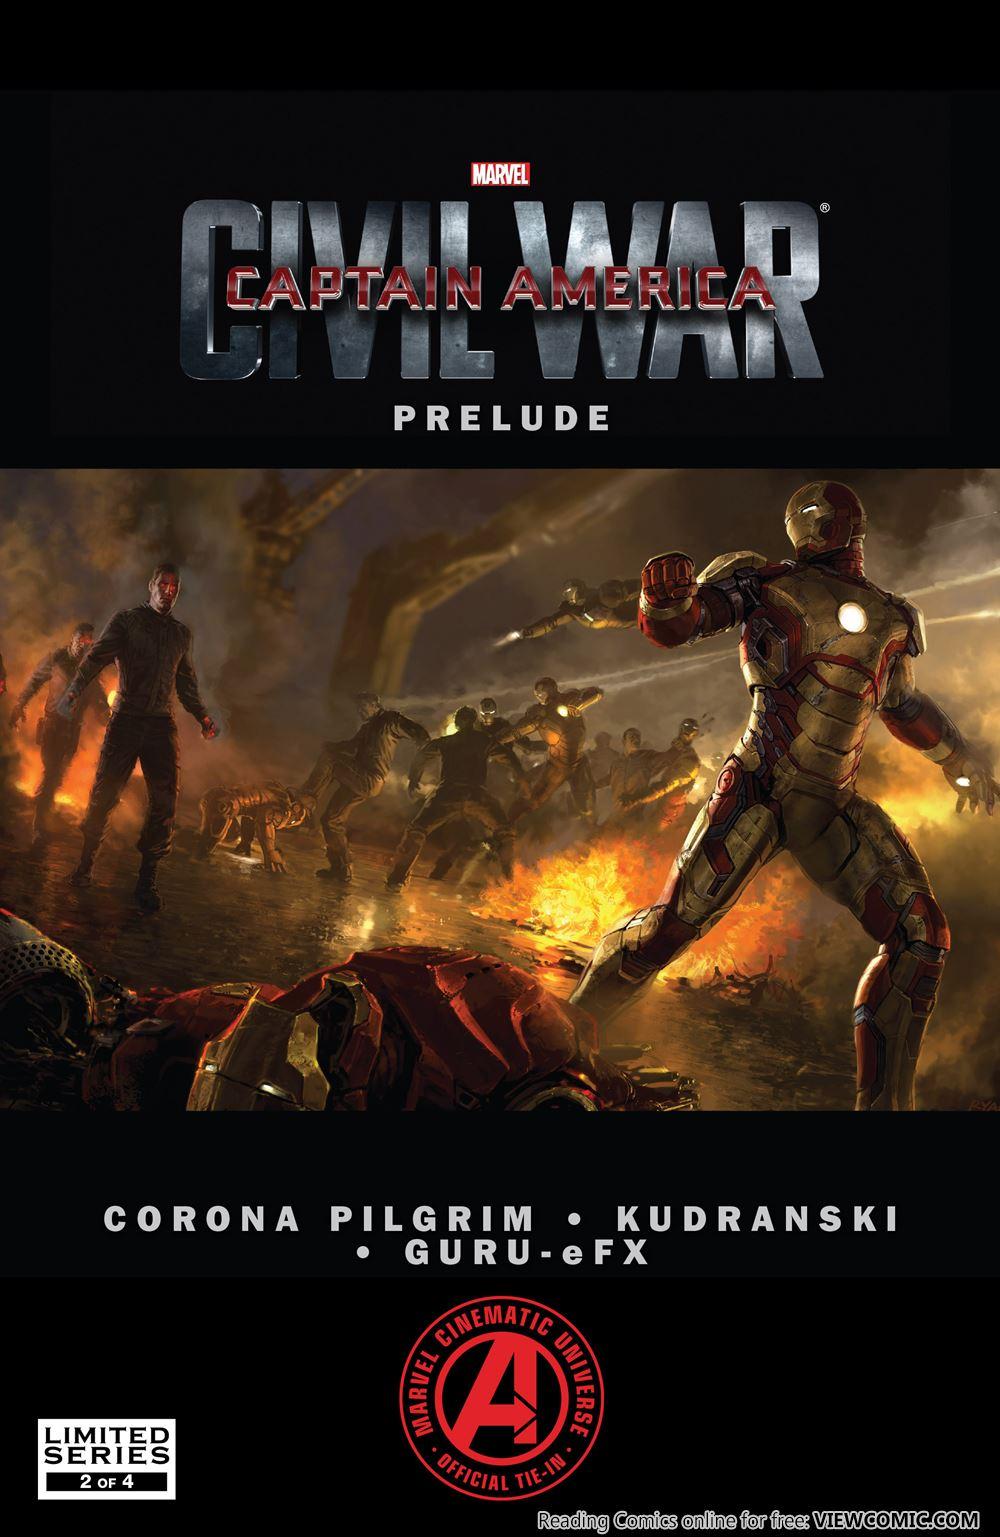 Marvel's Captain America – Civil War Prelude